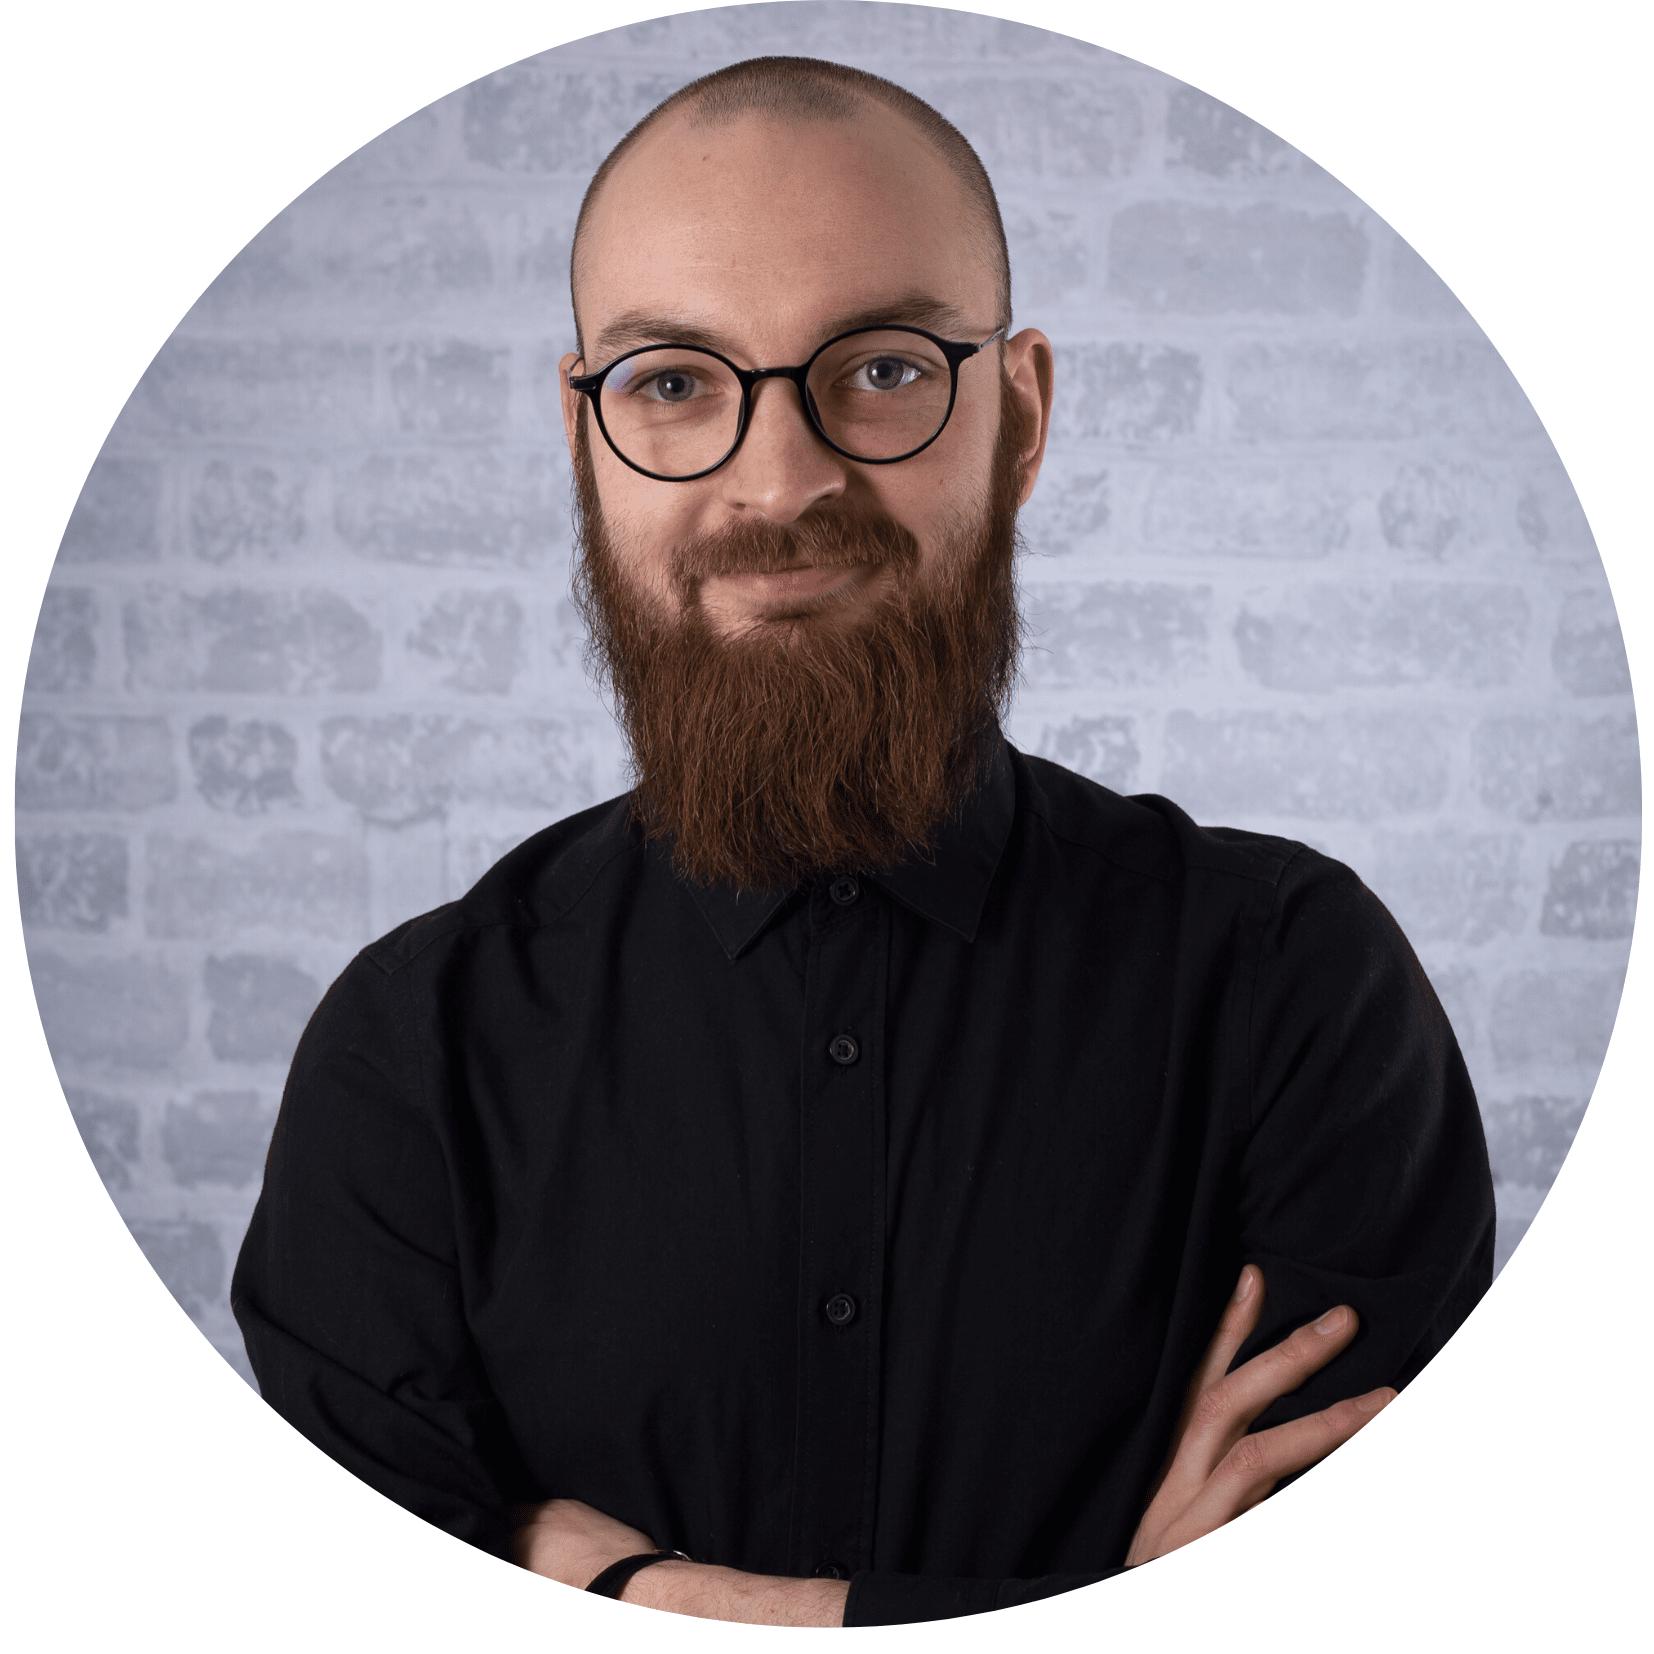 Mikolaj_Wojtkowiak_projektant_designer